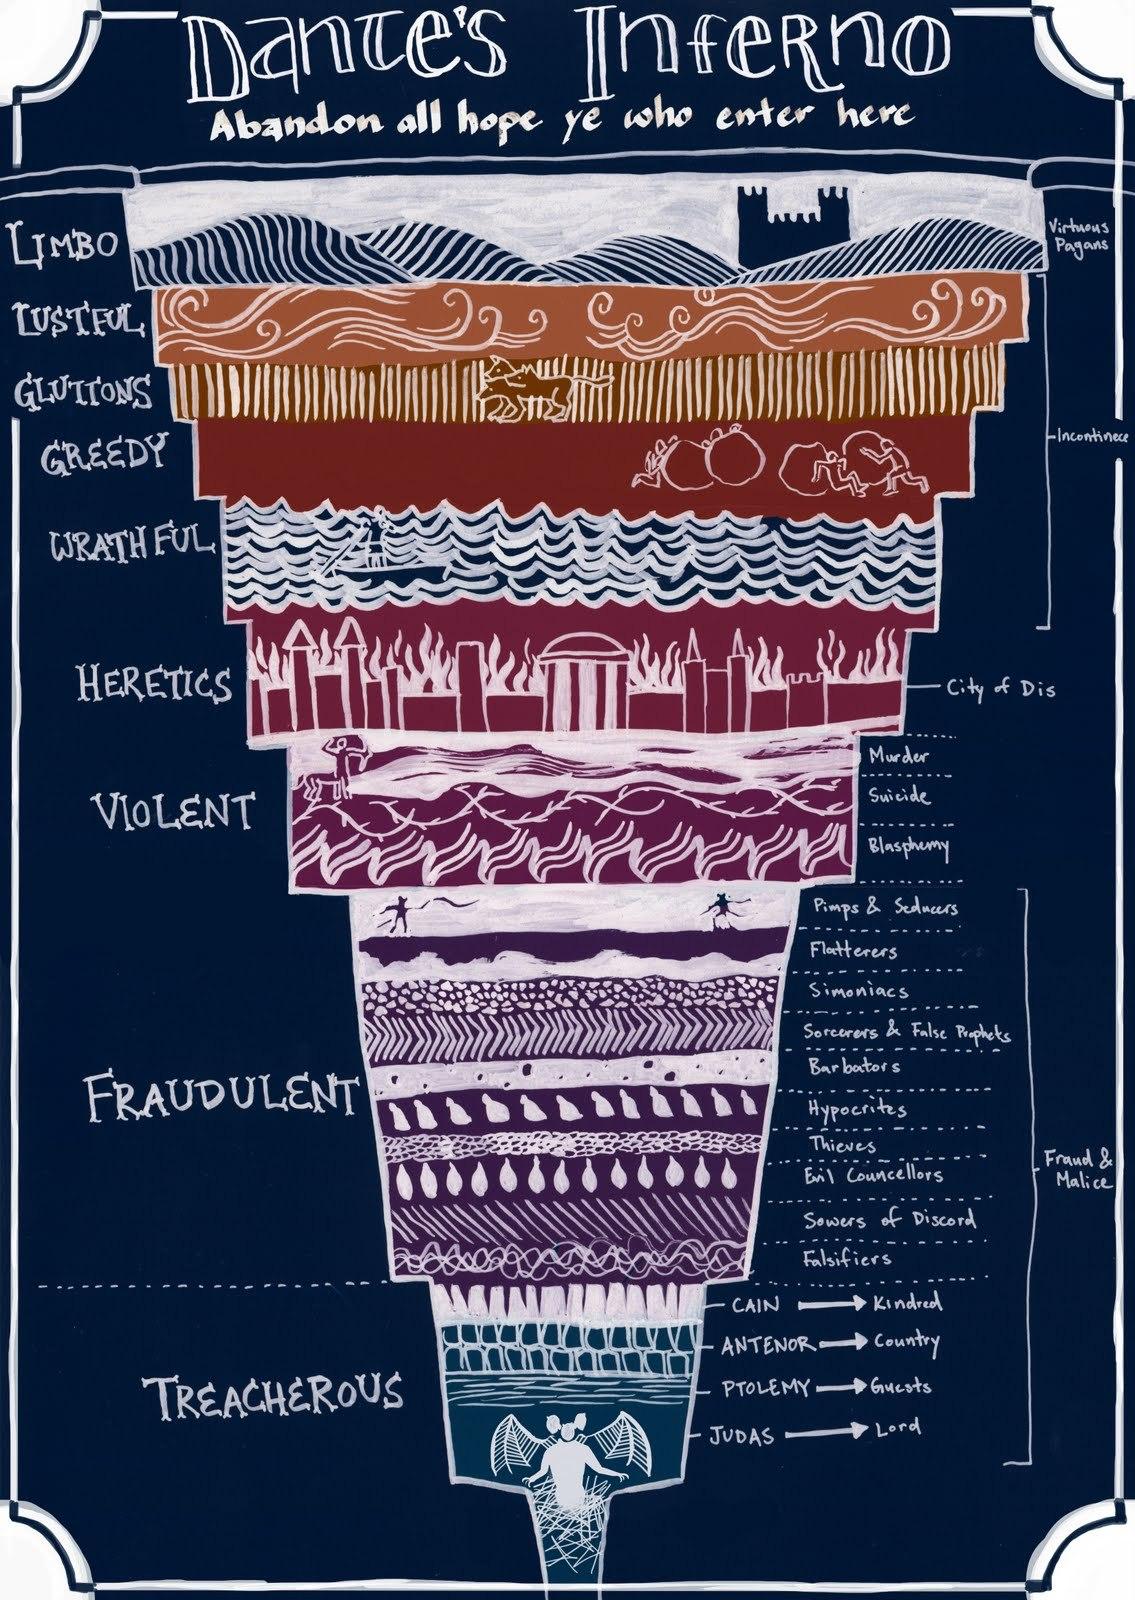 Dante's Inferno: a helpful diagram to eternal damnation |